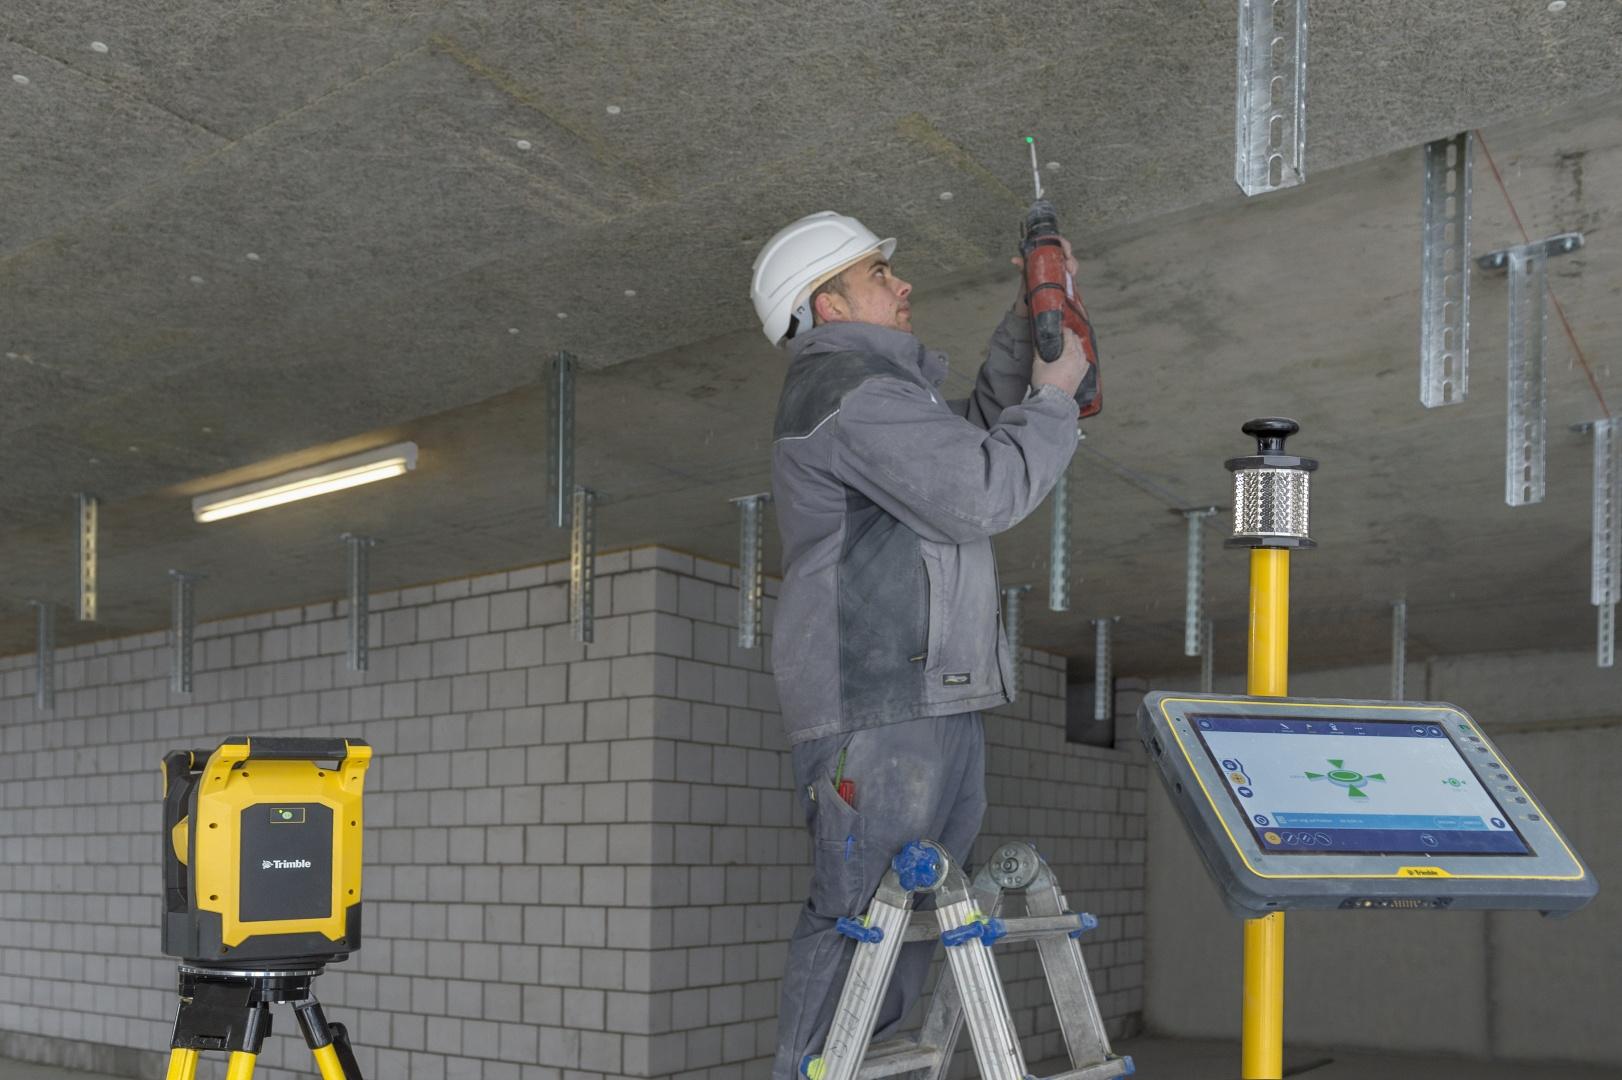 Arbeitspaket Befestigungstechnik © Alpiq InTec Schweiz AG, Webereiweg 6, 4802 Strengelbach